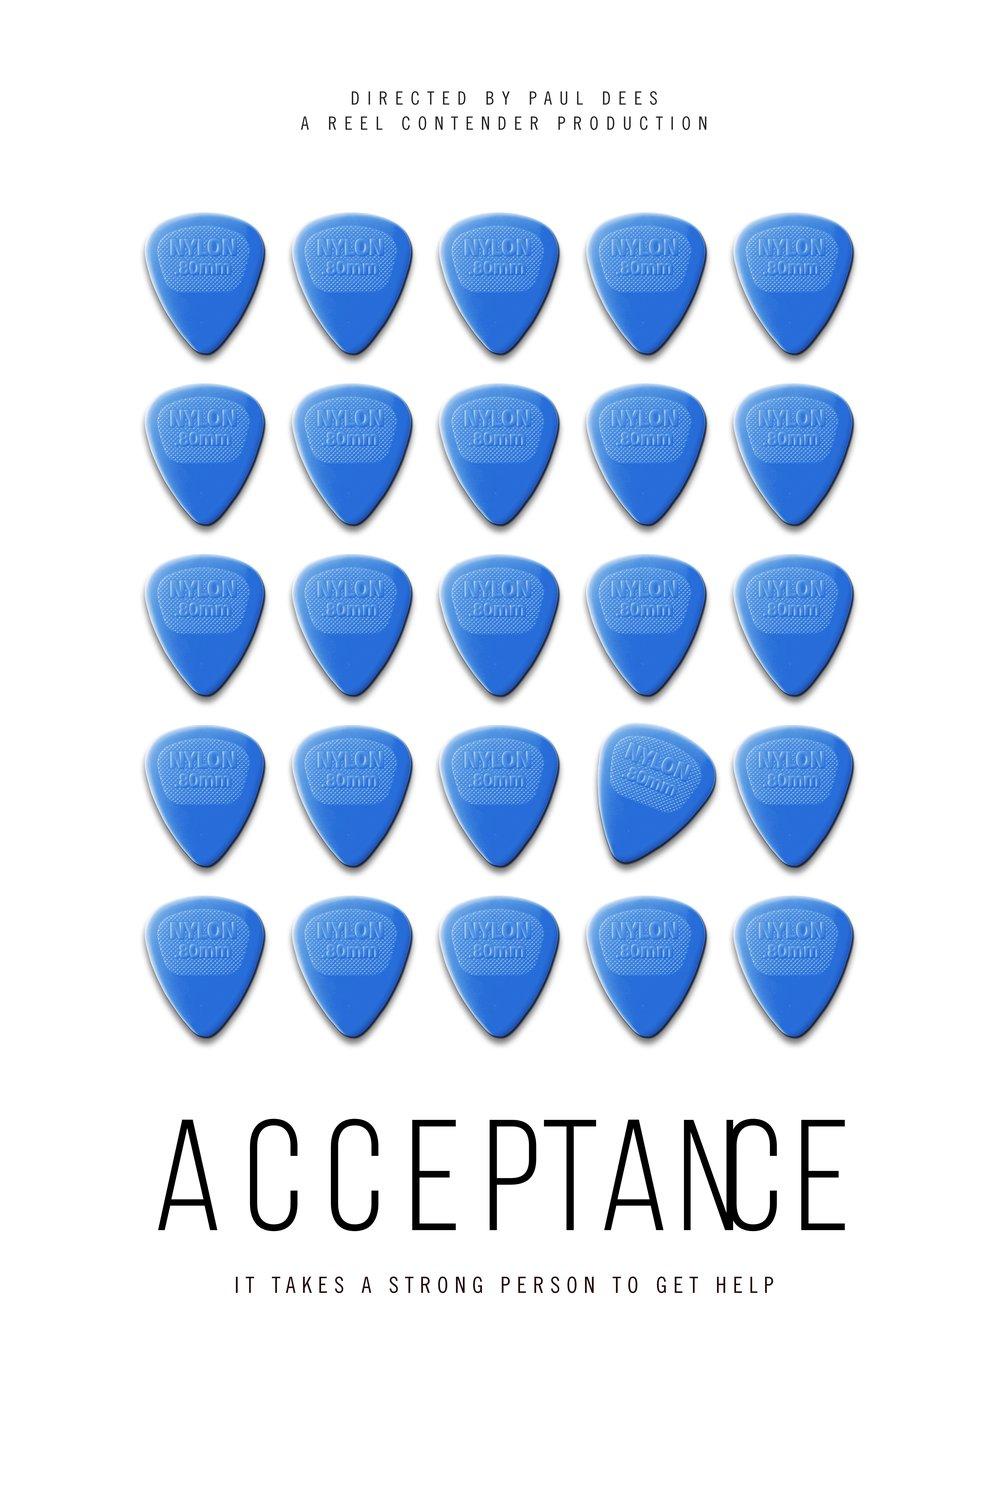 acceptanceV2Artboard 1 copy 2.jpg.jpeg